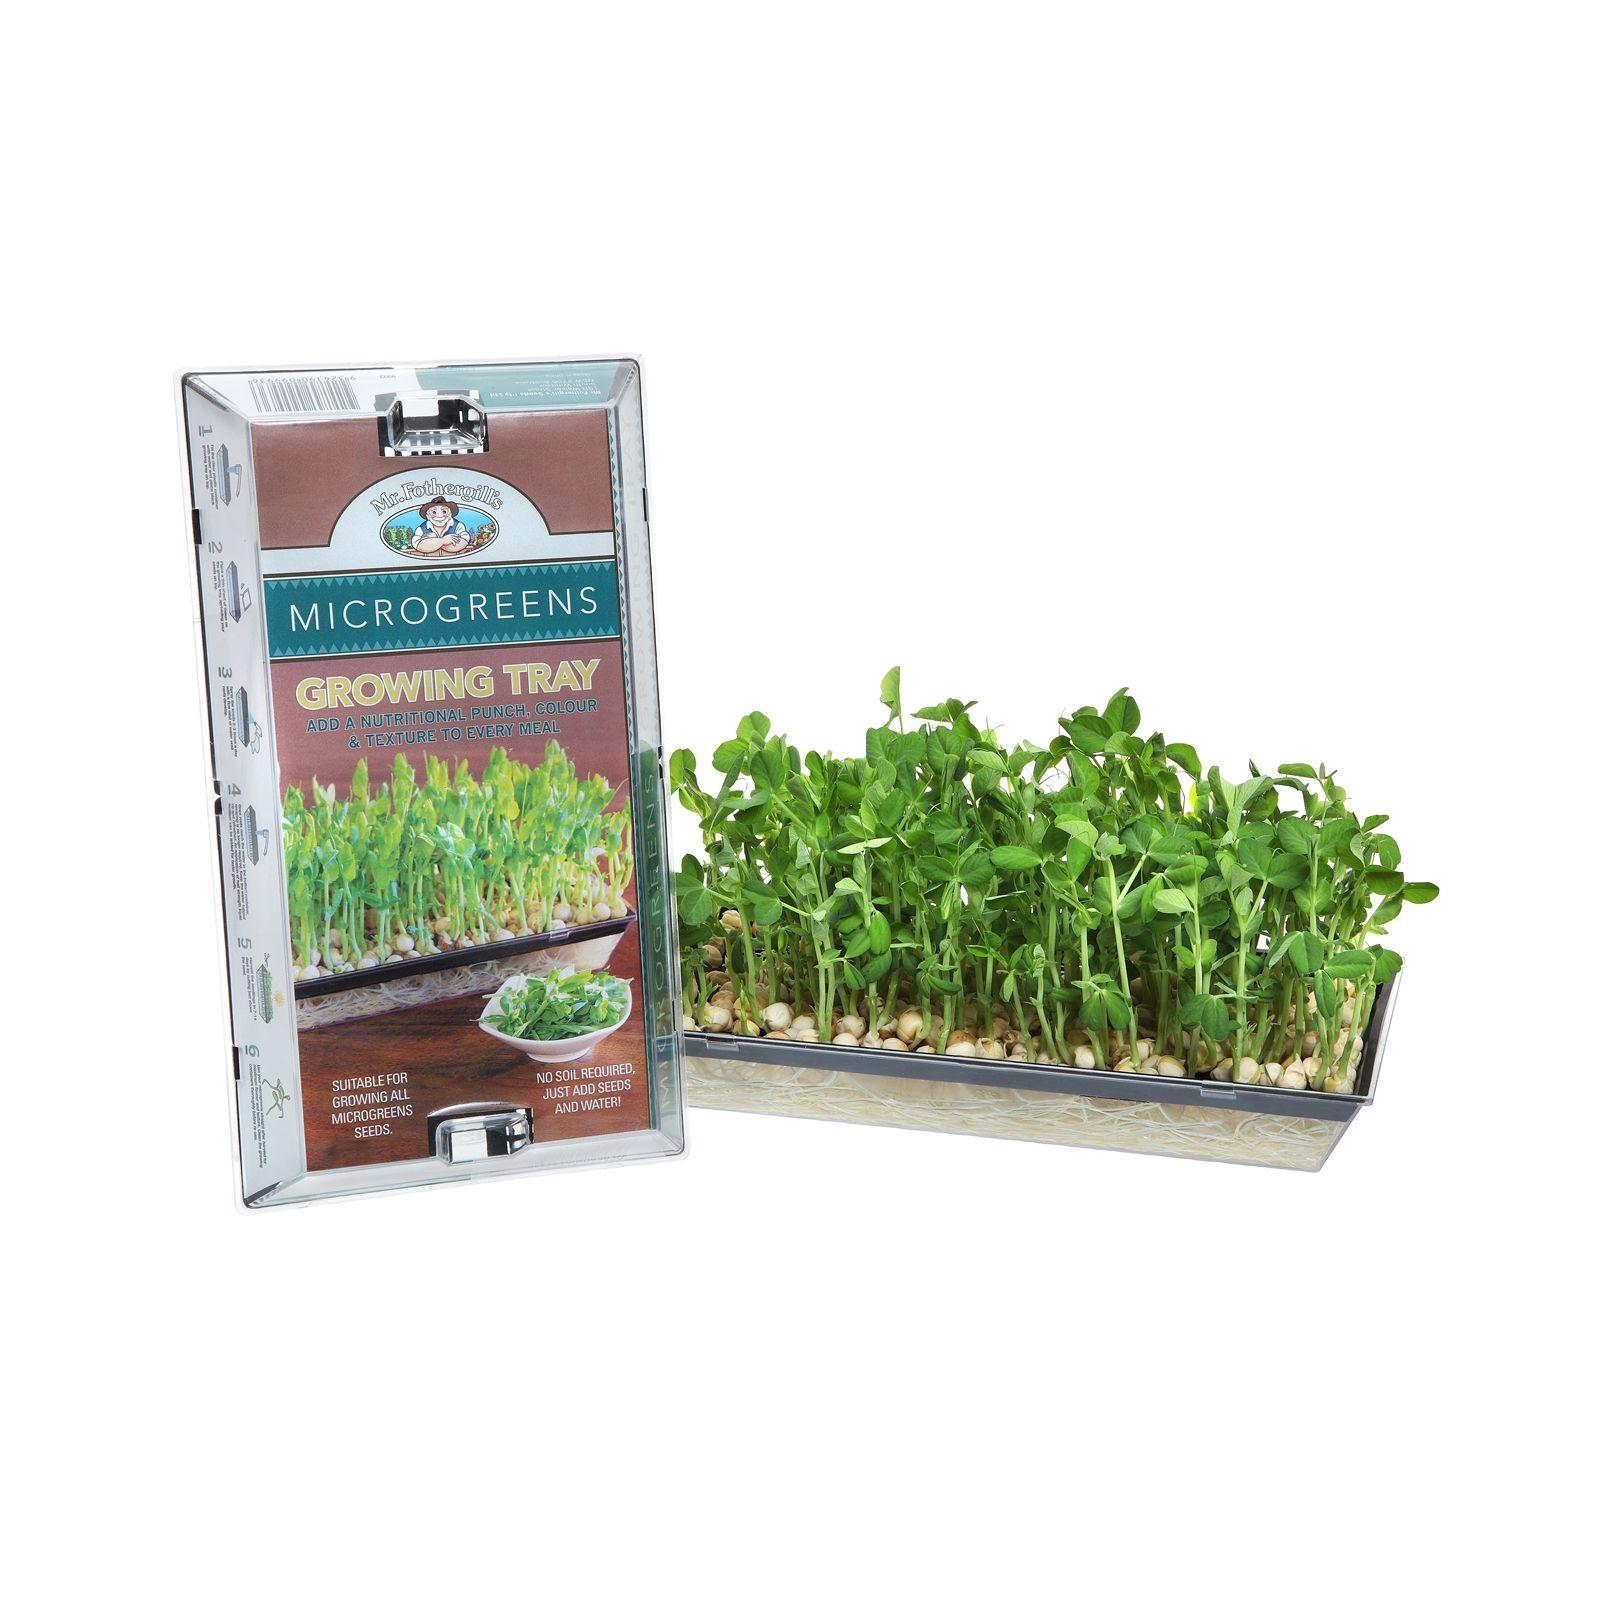 Mr Fothergill S Microgreens Growing Tray Bunnings Warehouse Microgreens Seed Starters Growing Backyard farmer greenhouse bunnings